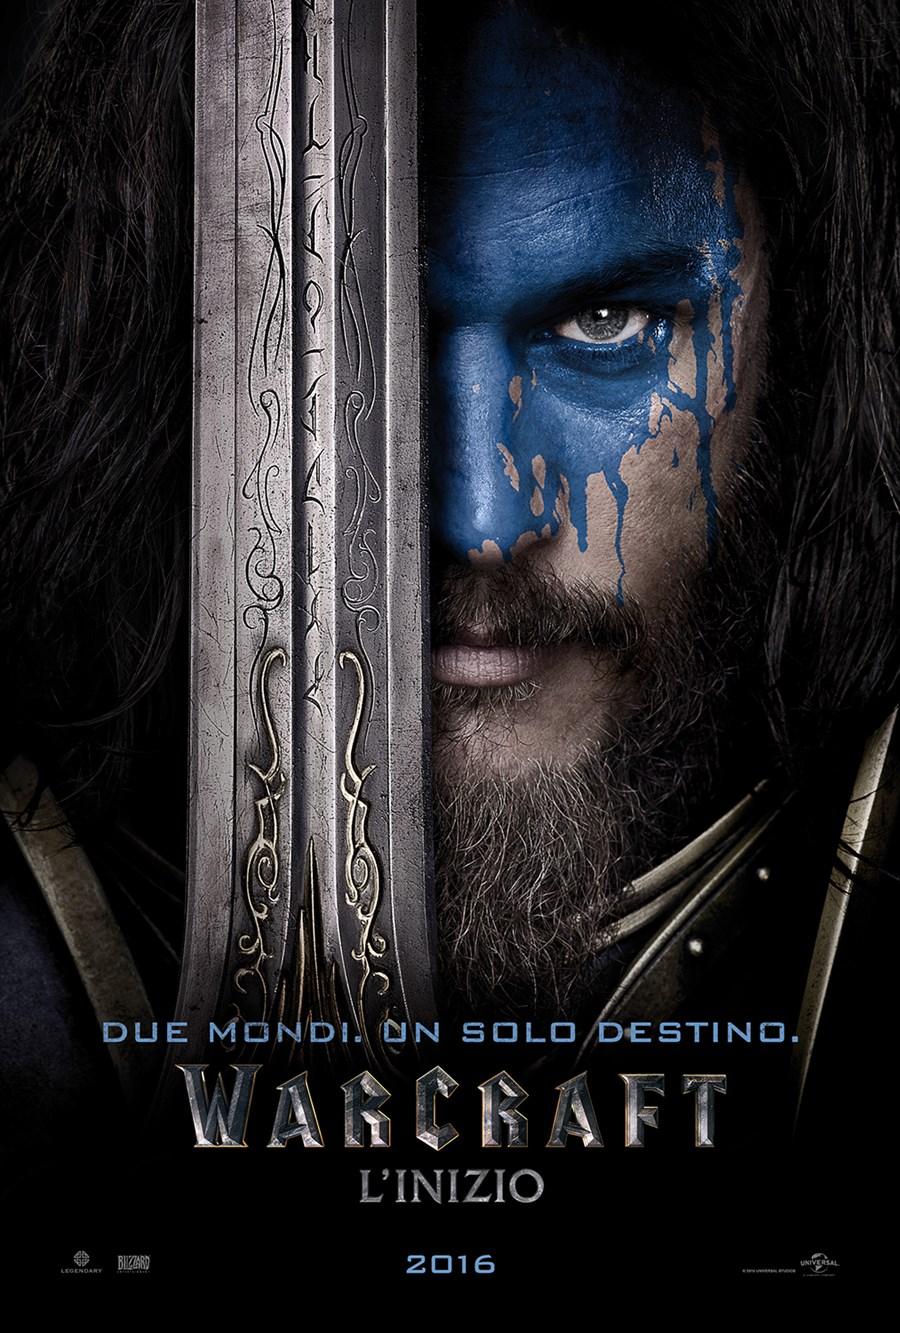 Warcraft - L'inizio: il character poster di Lothar